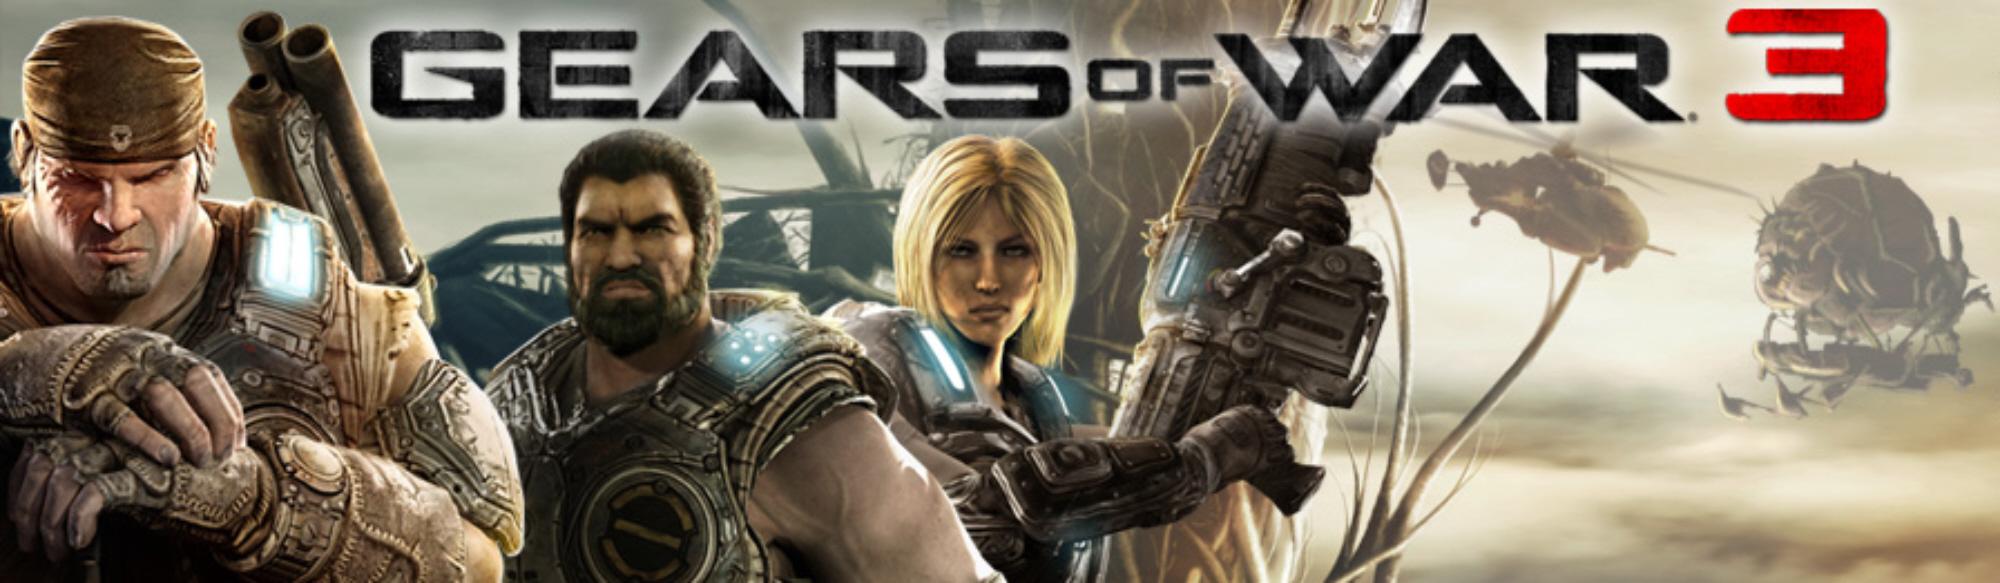 gears of war cosplay guide